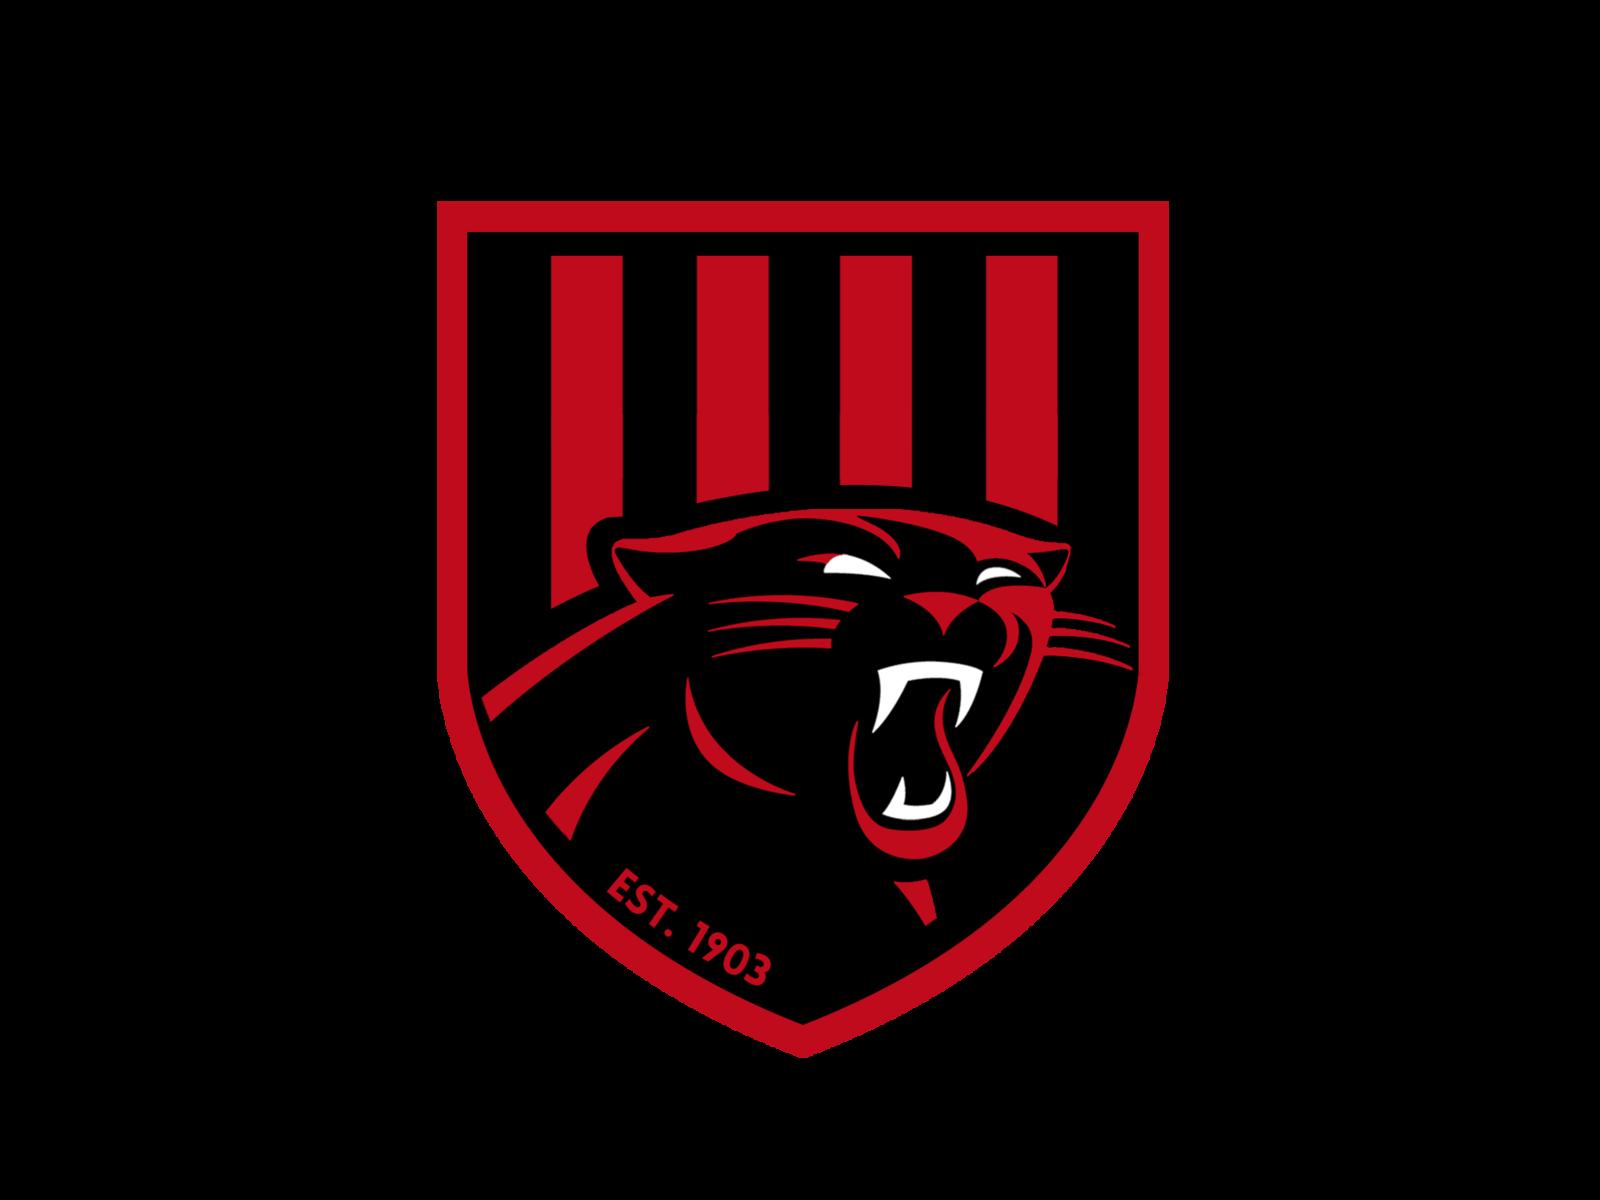 blackburn logo8 black text.png